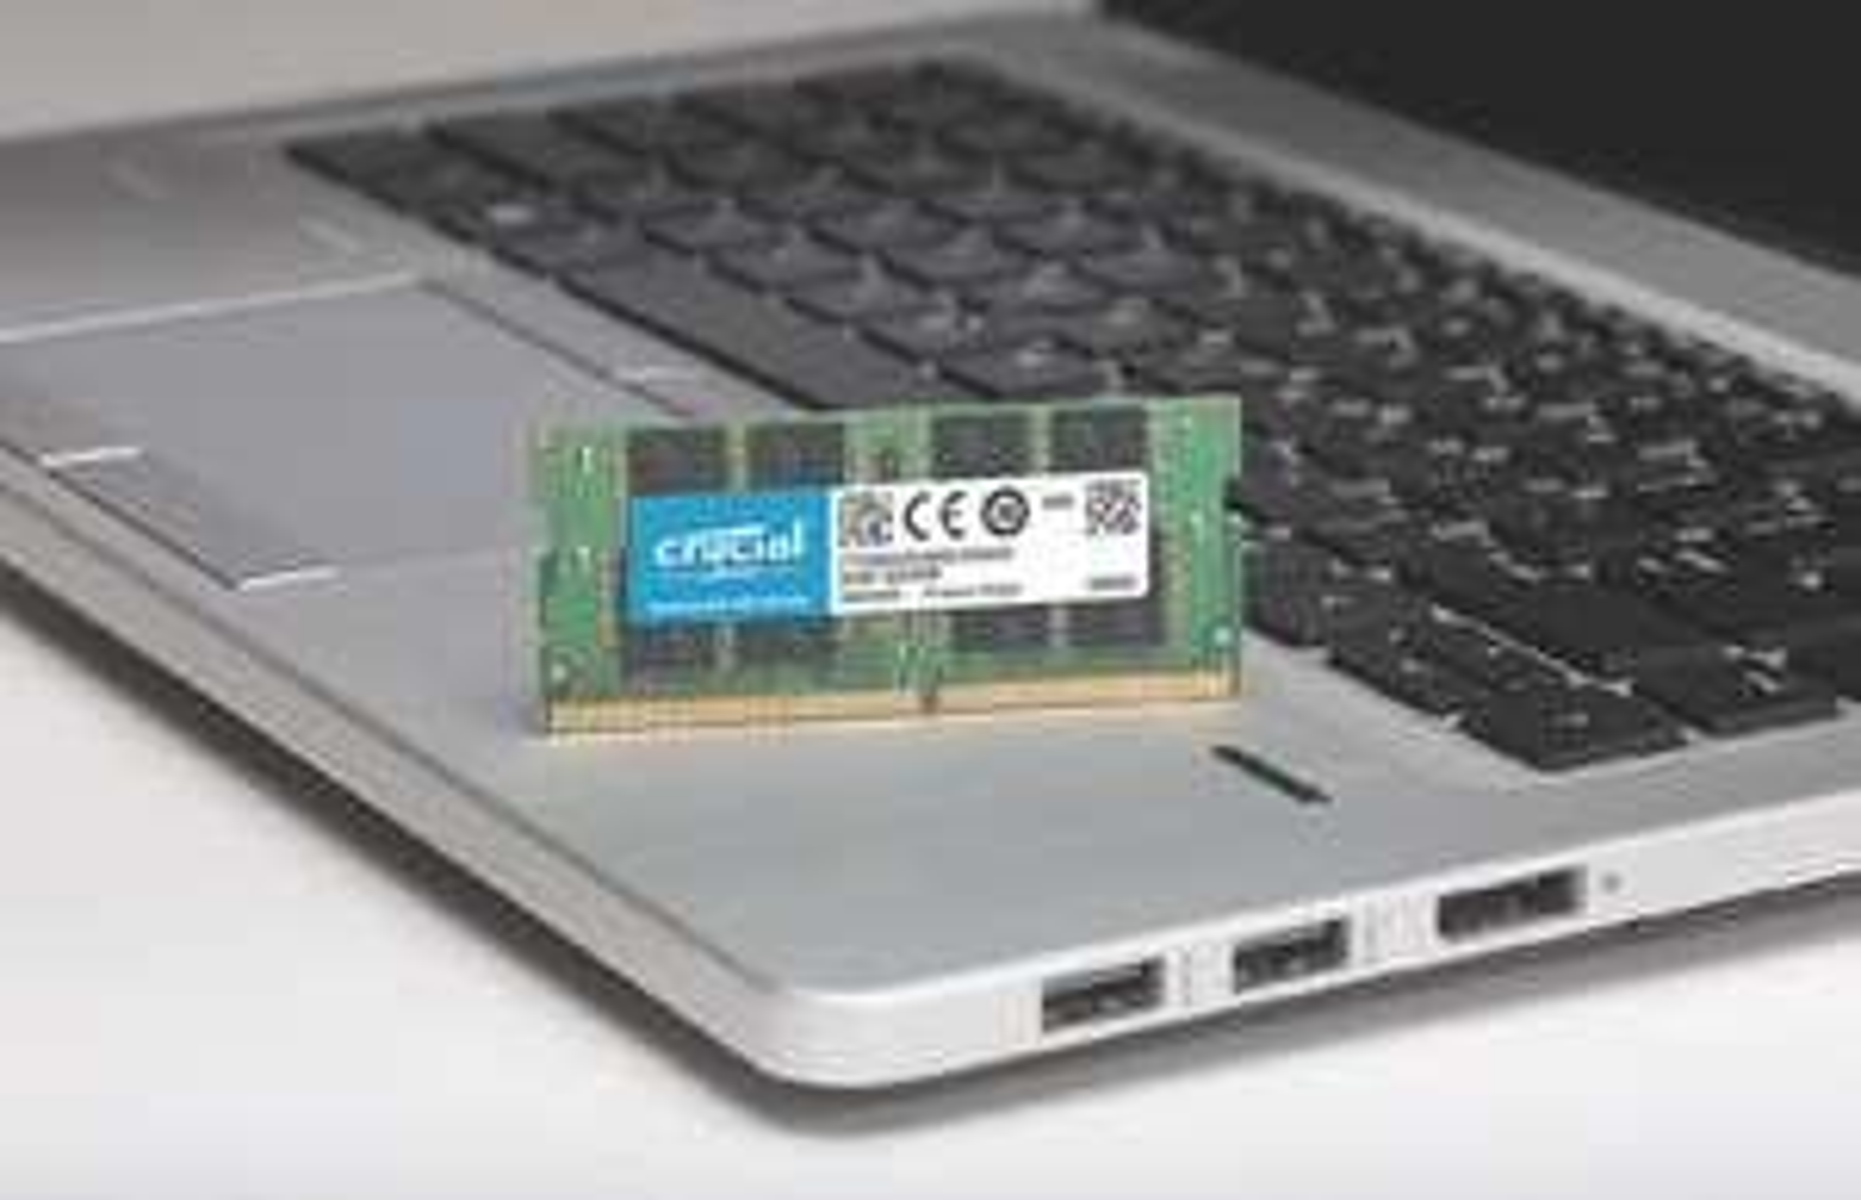 Barrette de RAM SODIMM Crucial - 8 Go (DDR4, 2666Mhz, 260-Pin)